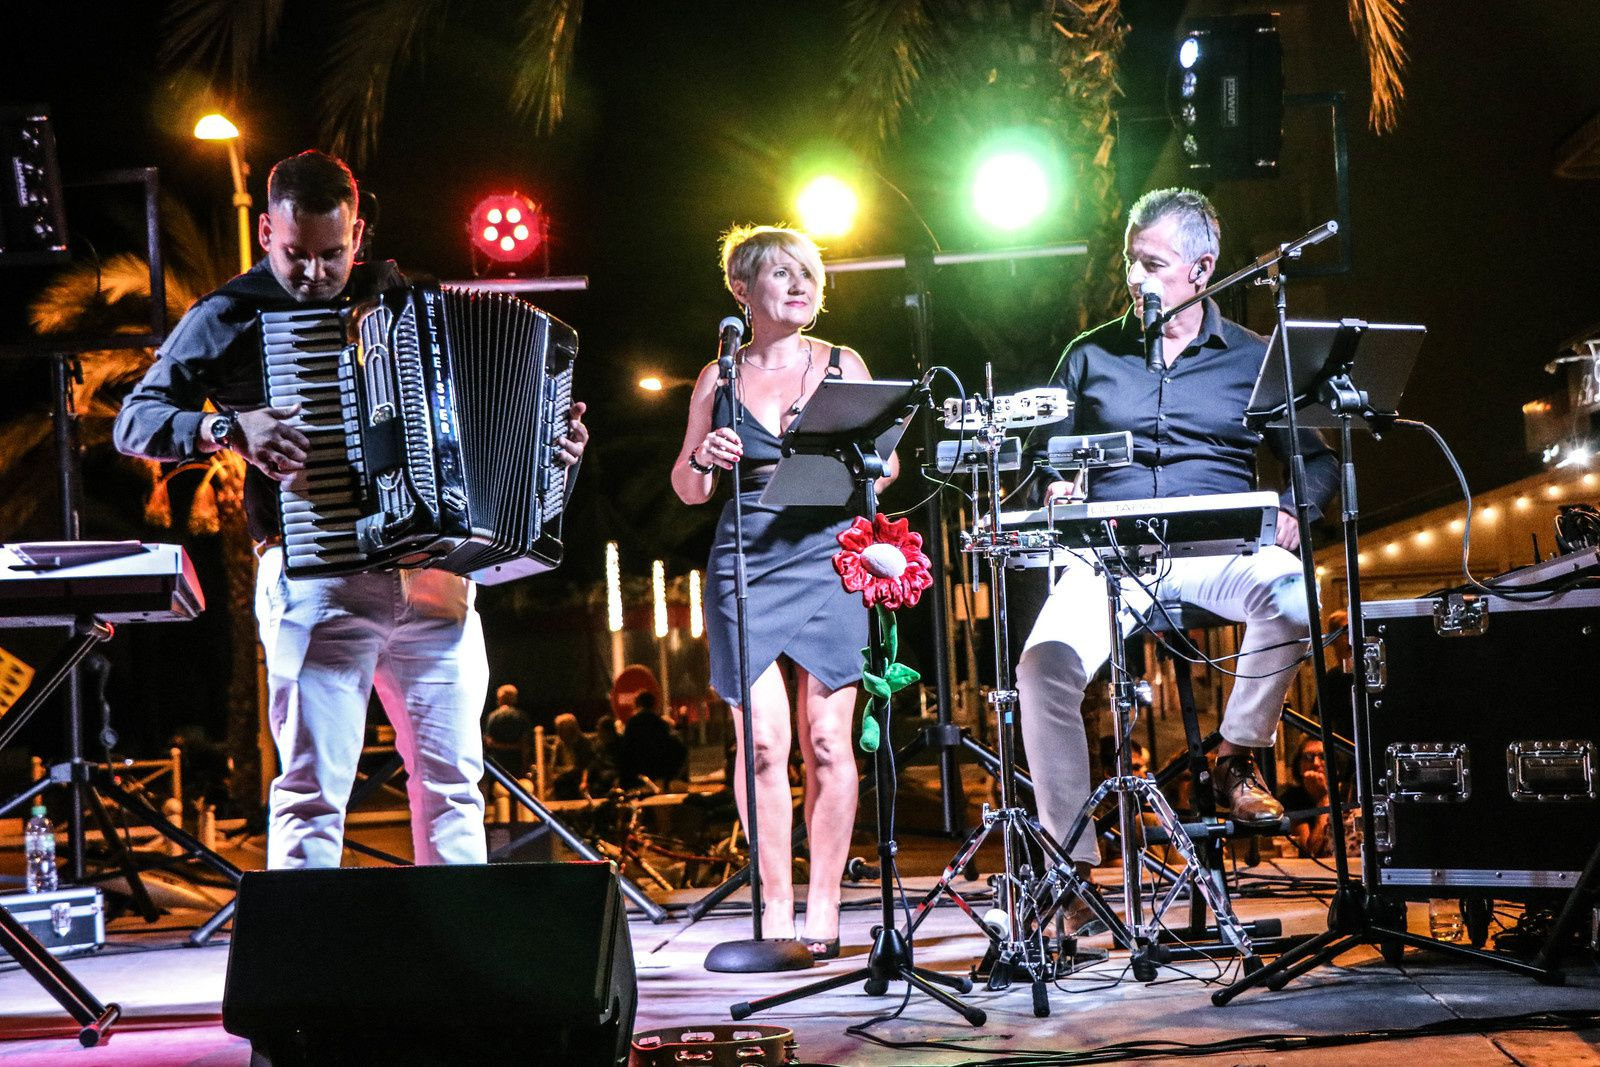 Orchestre musette à Millau